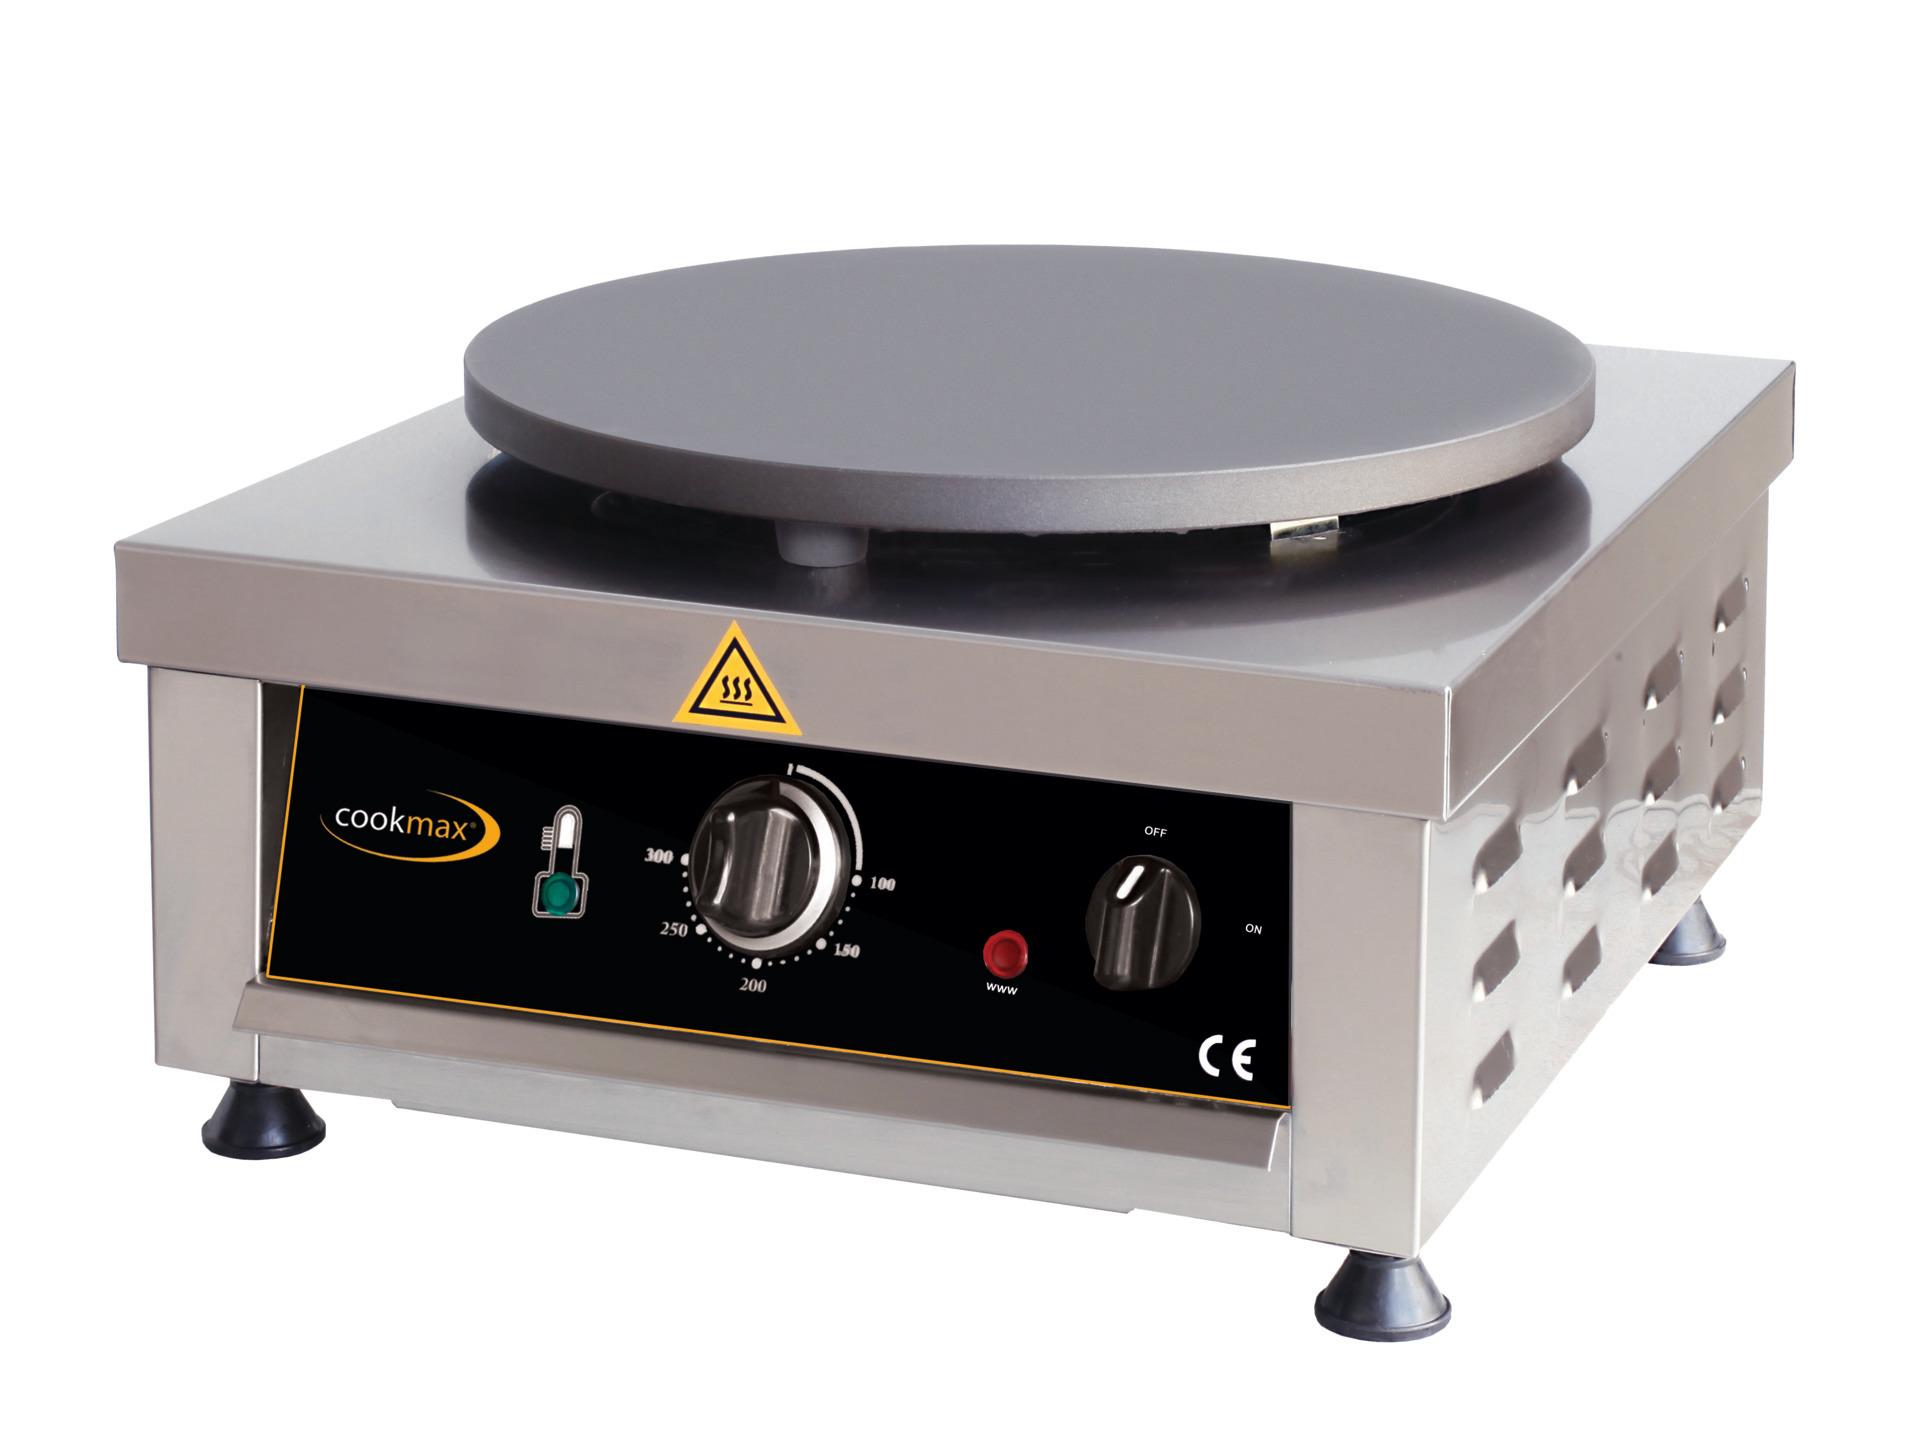 Elektro-Crepiere 1 Backfläche ø 400 mm / 500 x 450 x 220 mm